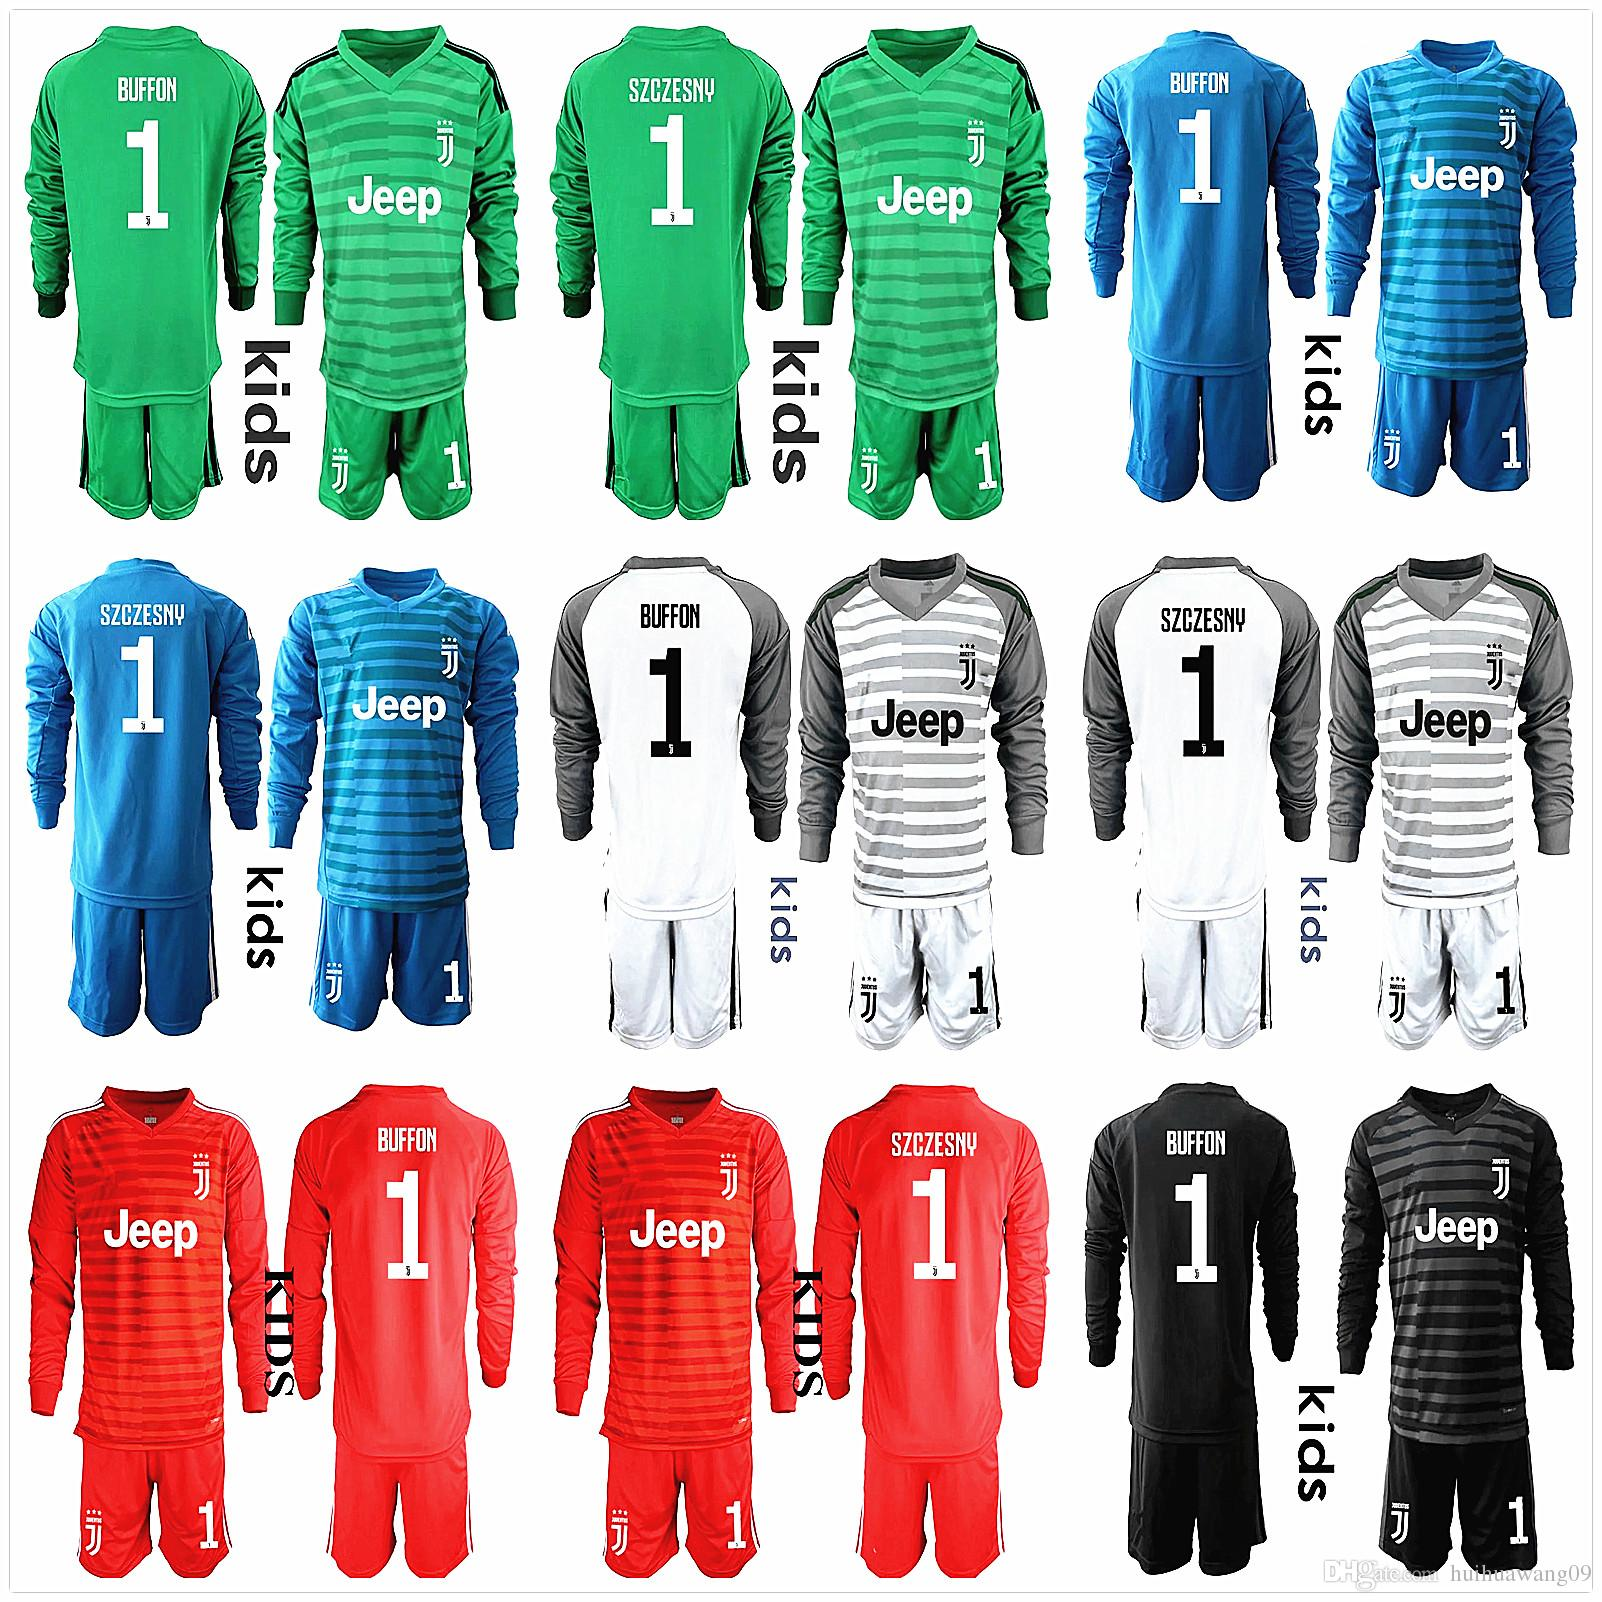 f797775f7 ... closeout best 2018 19 youth long sleeve juventusi goalkeeper jerseys  kids soccer sets 1 buffon kid